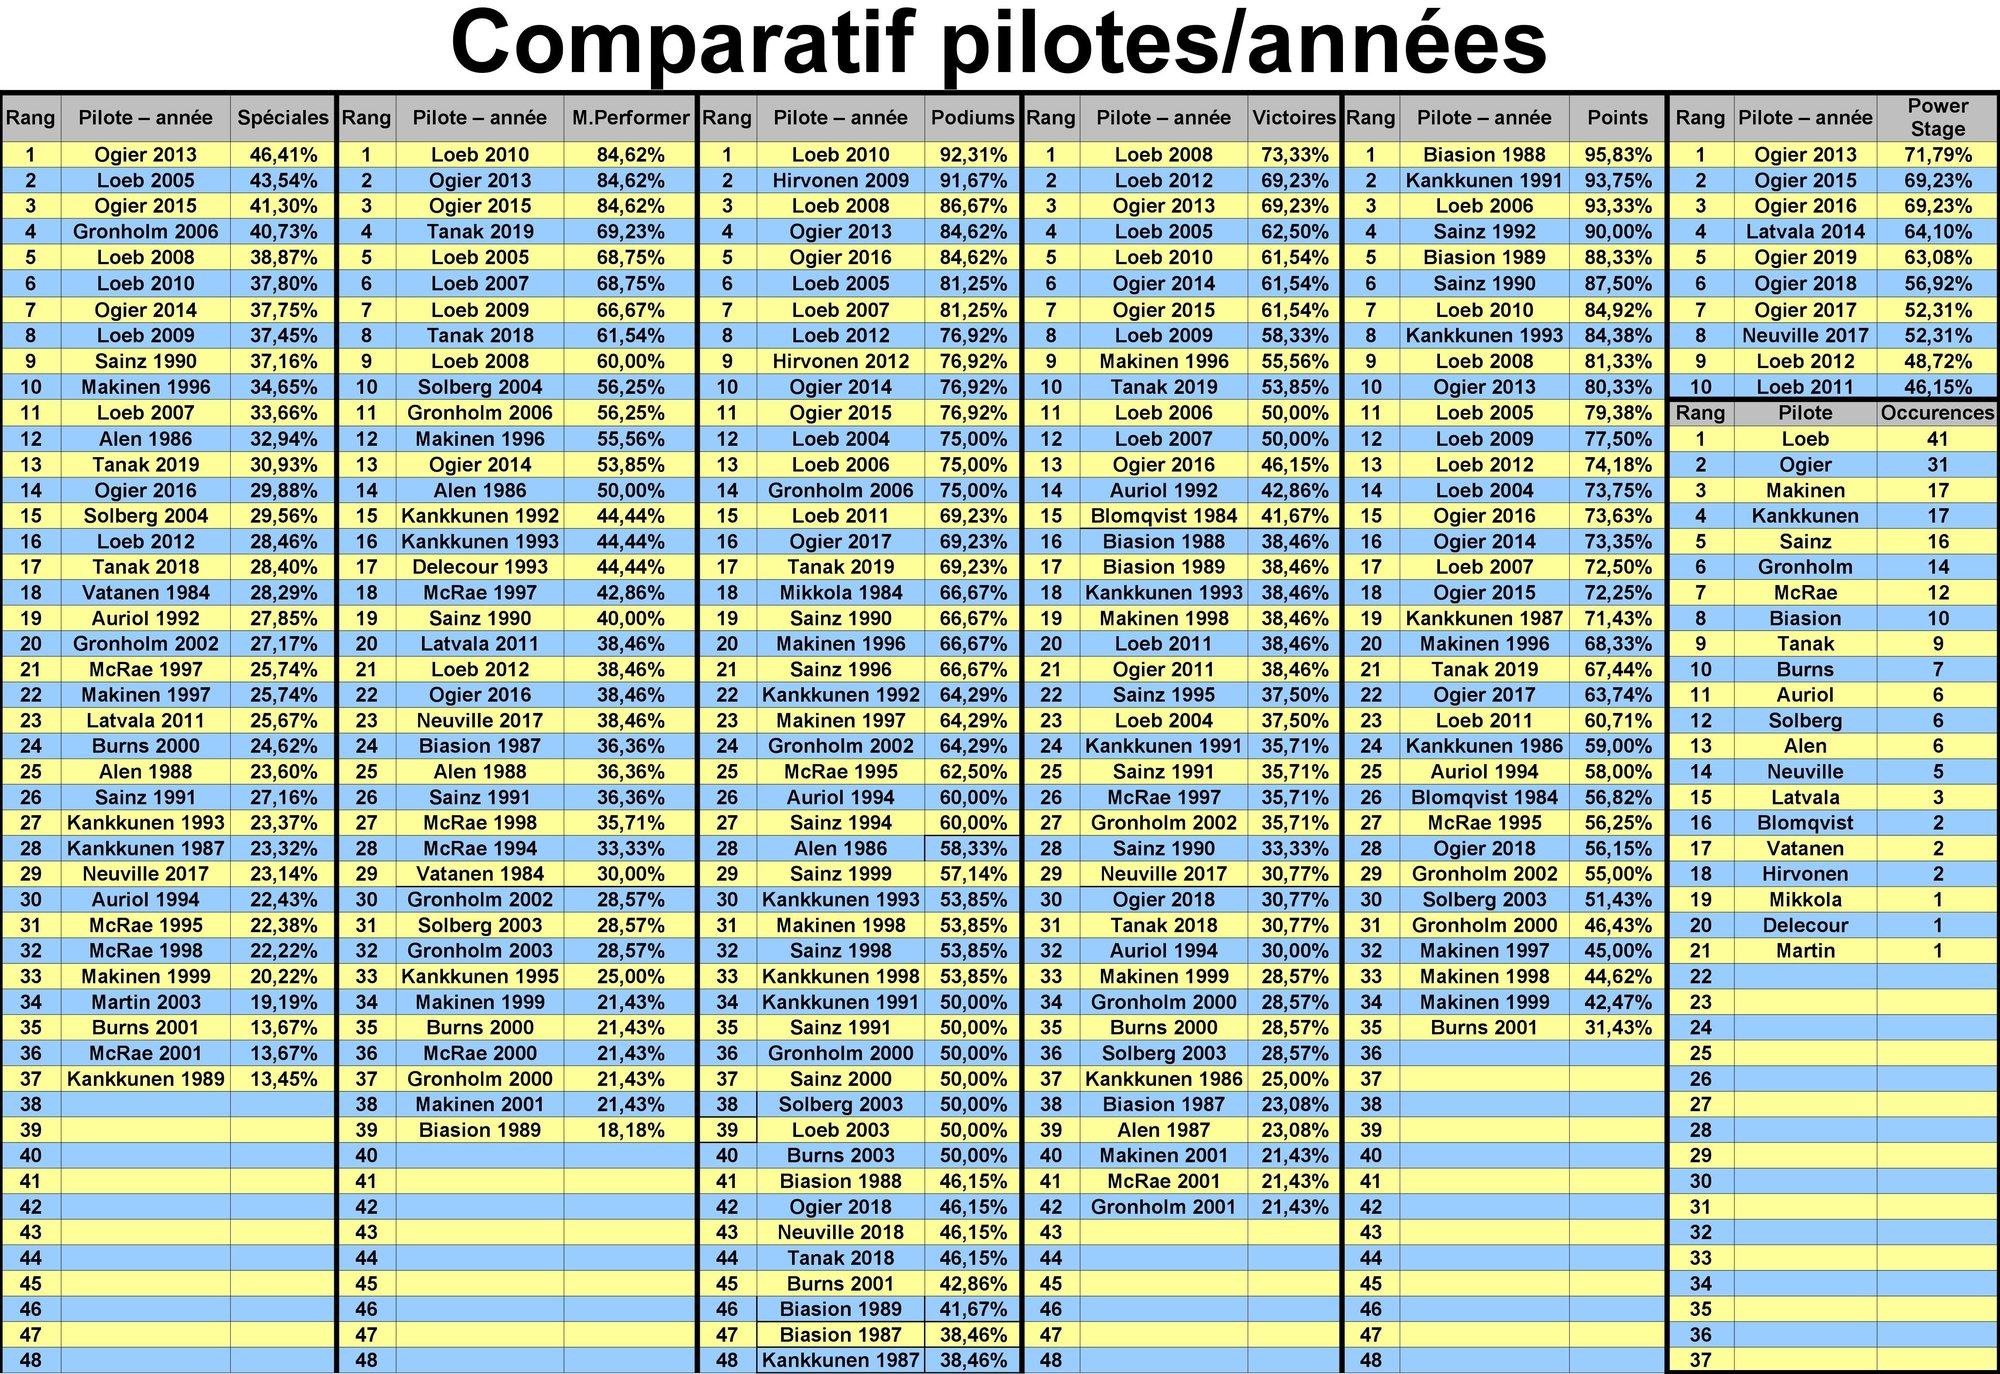 2111520110_comparatifpilotes-annes2019.thumb.jpg.f1466a8f653f062c4efa5a867278fb12.jpg